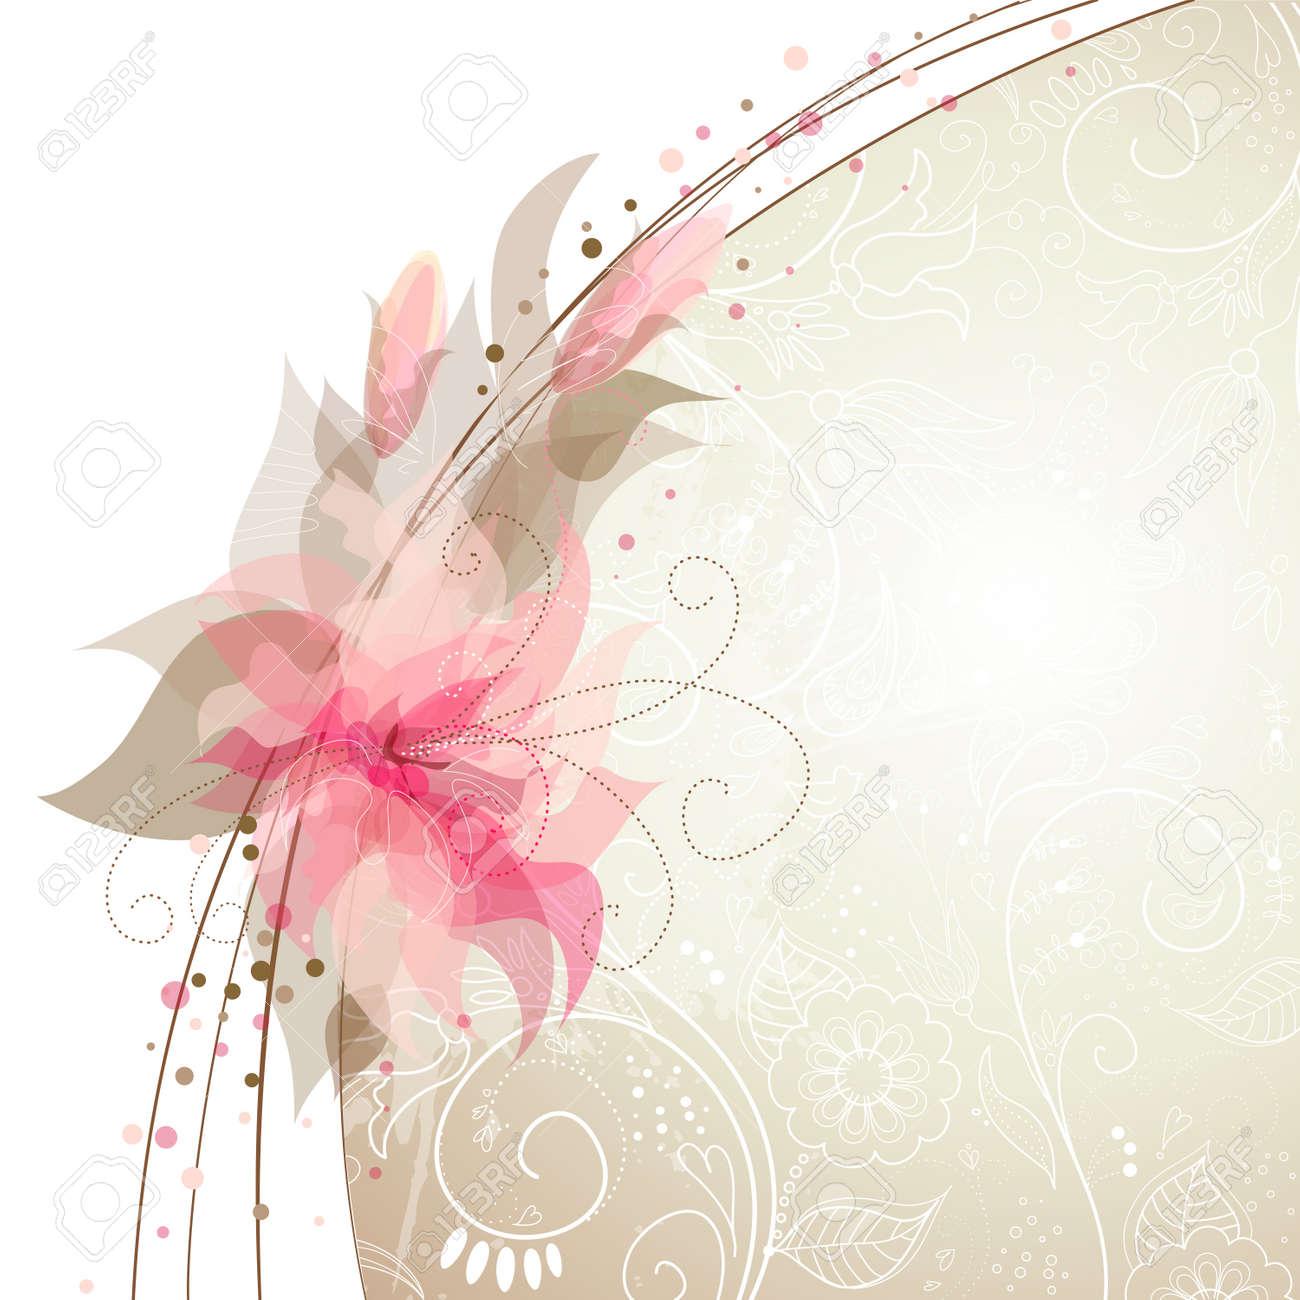 Romantic Flower Background Stock Vector - 12494210